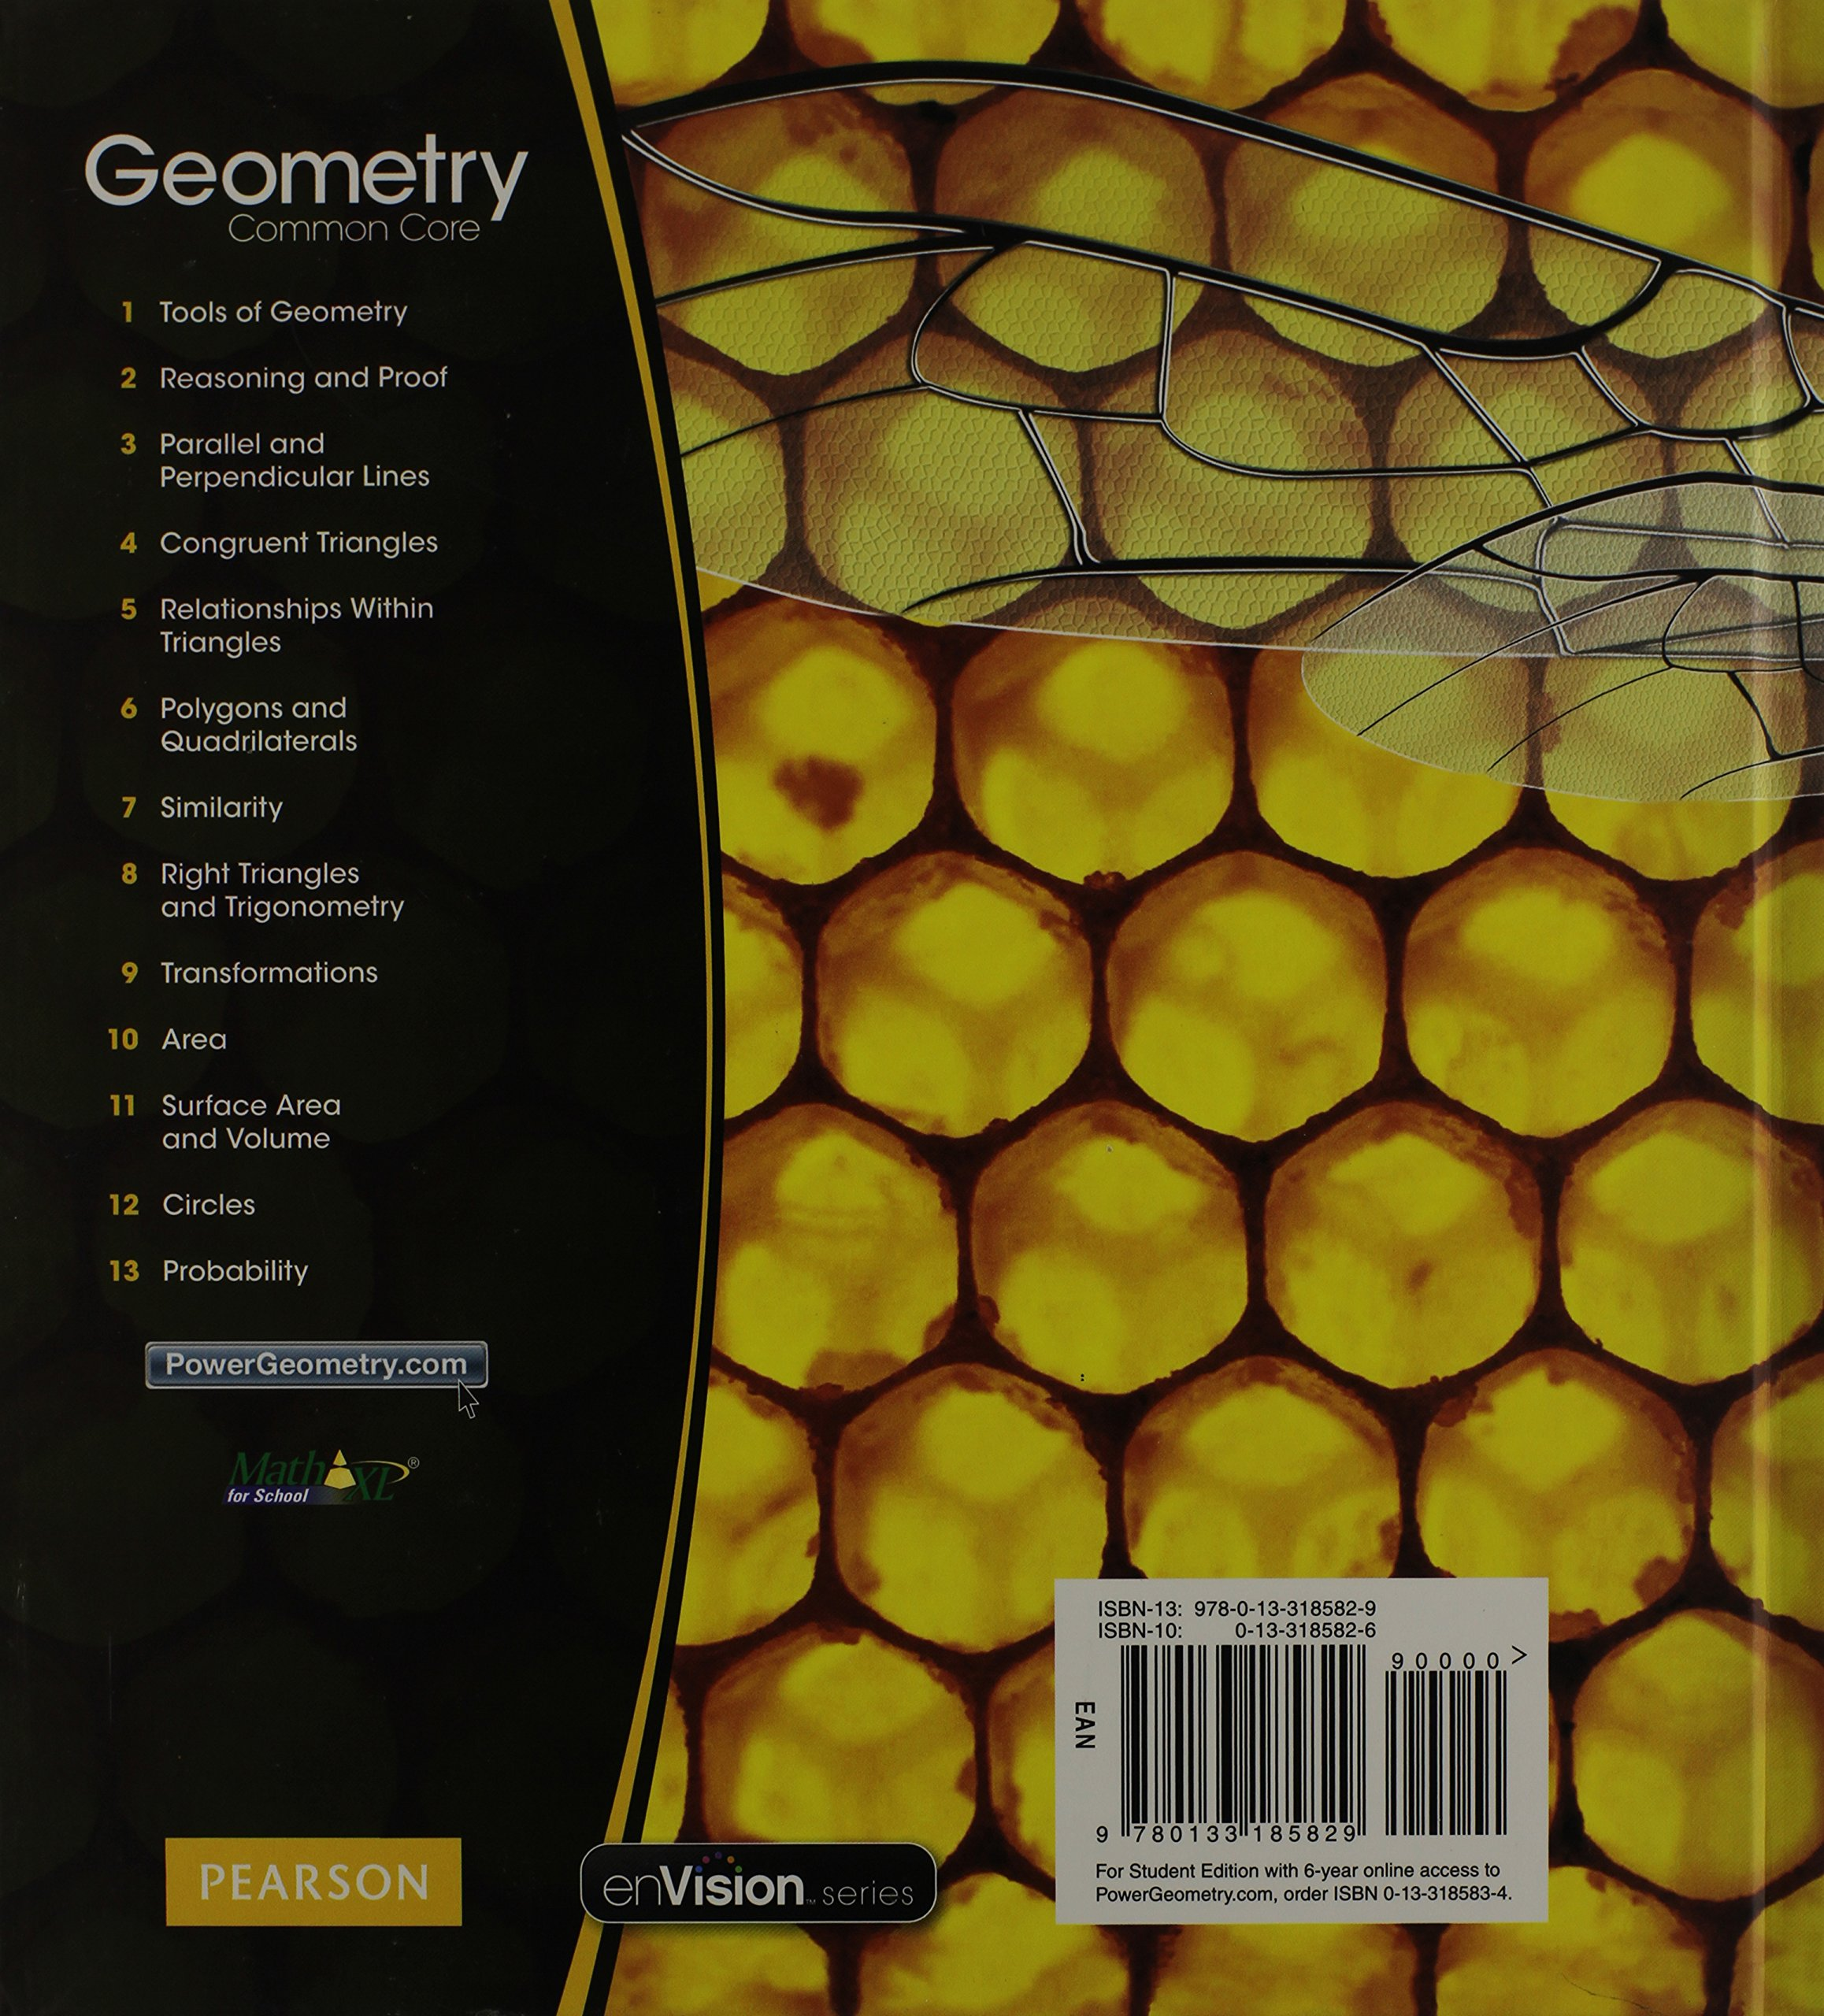 Amazon com: Geometry: Common Core Grade 10 (9780133185829